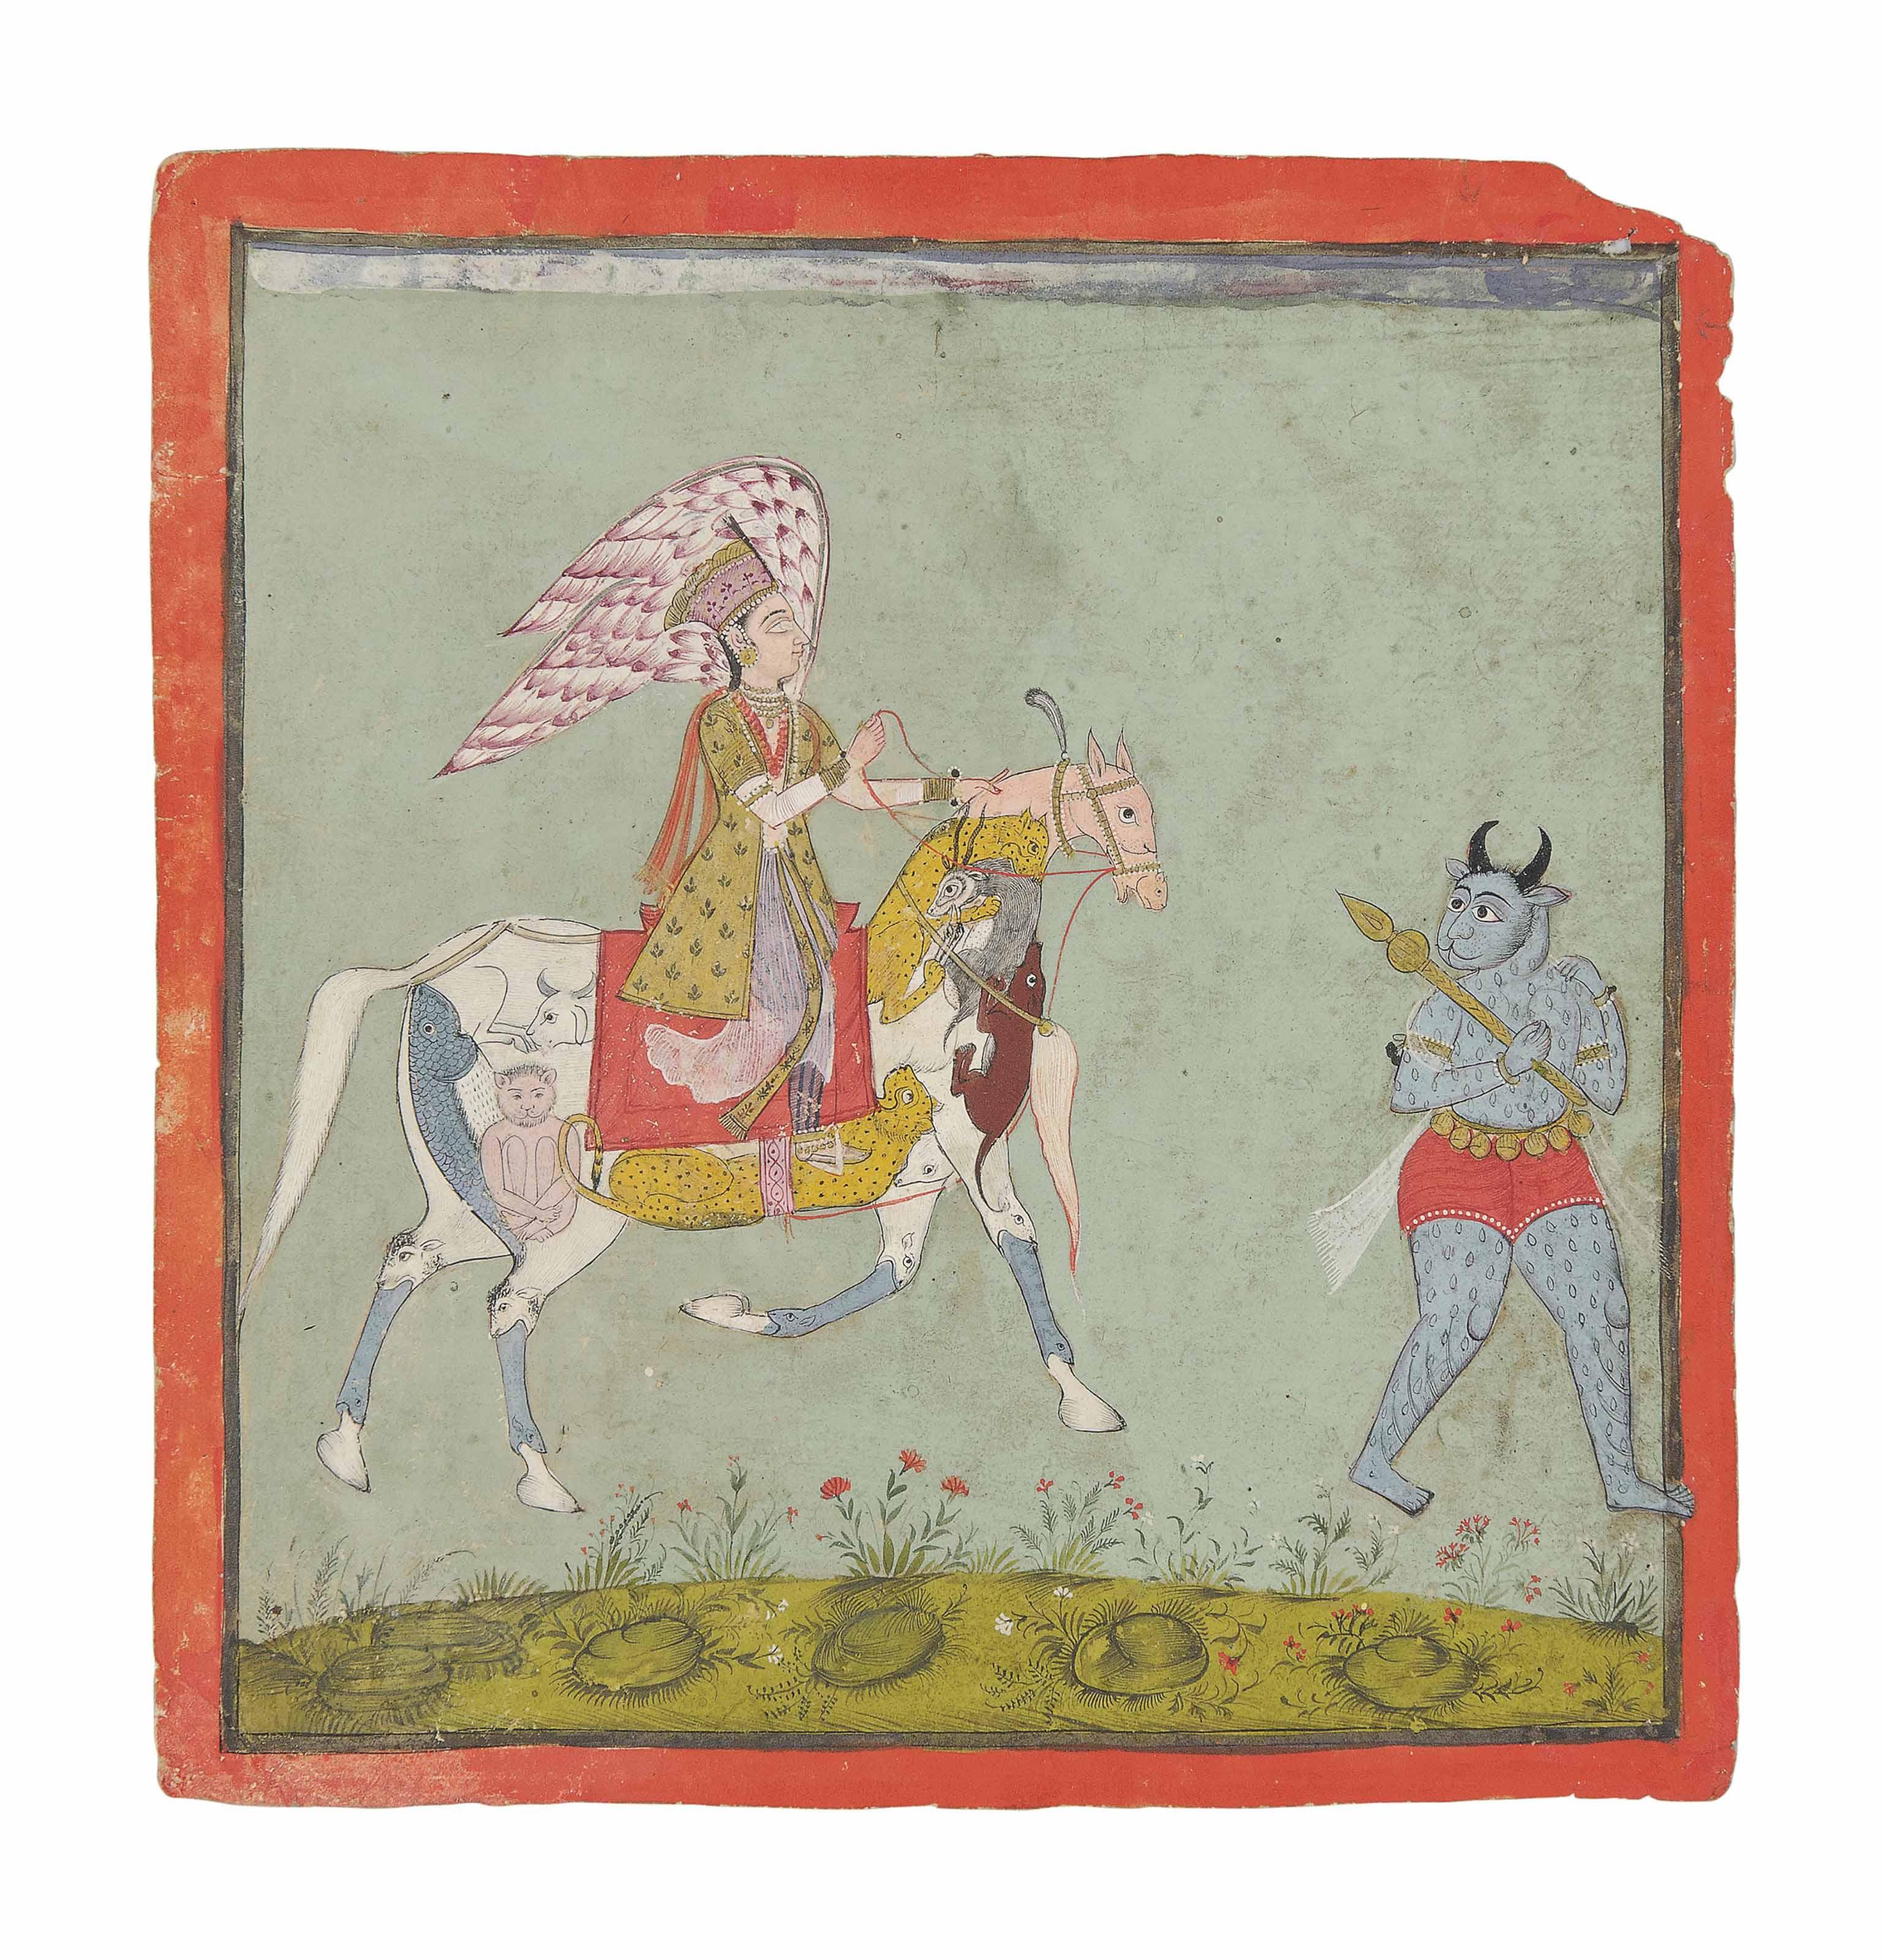 A PERI RIDING A COMPOSITE HORS